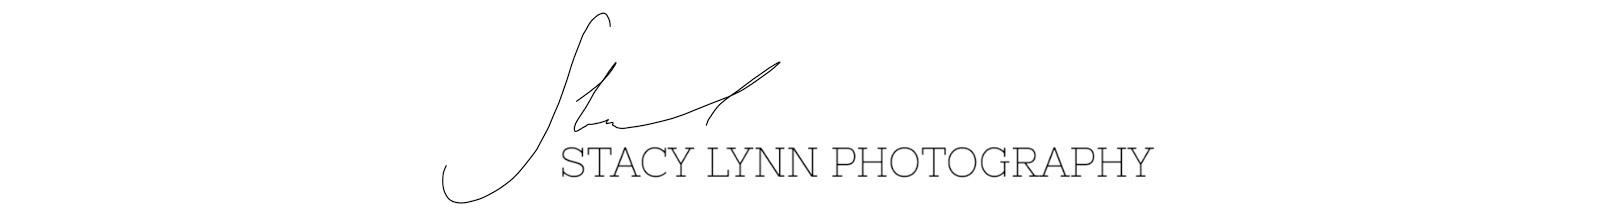 Stacy lynn Photography